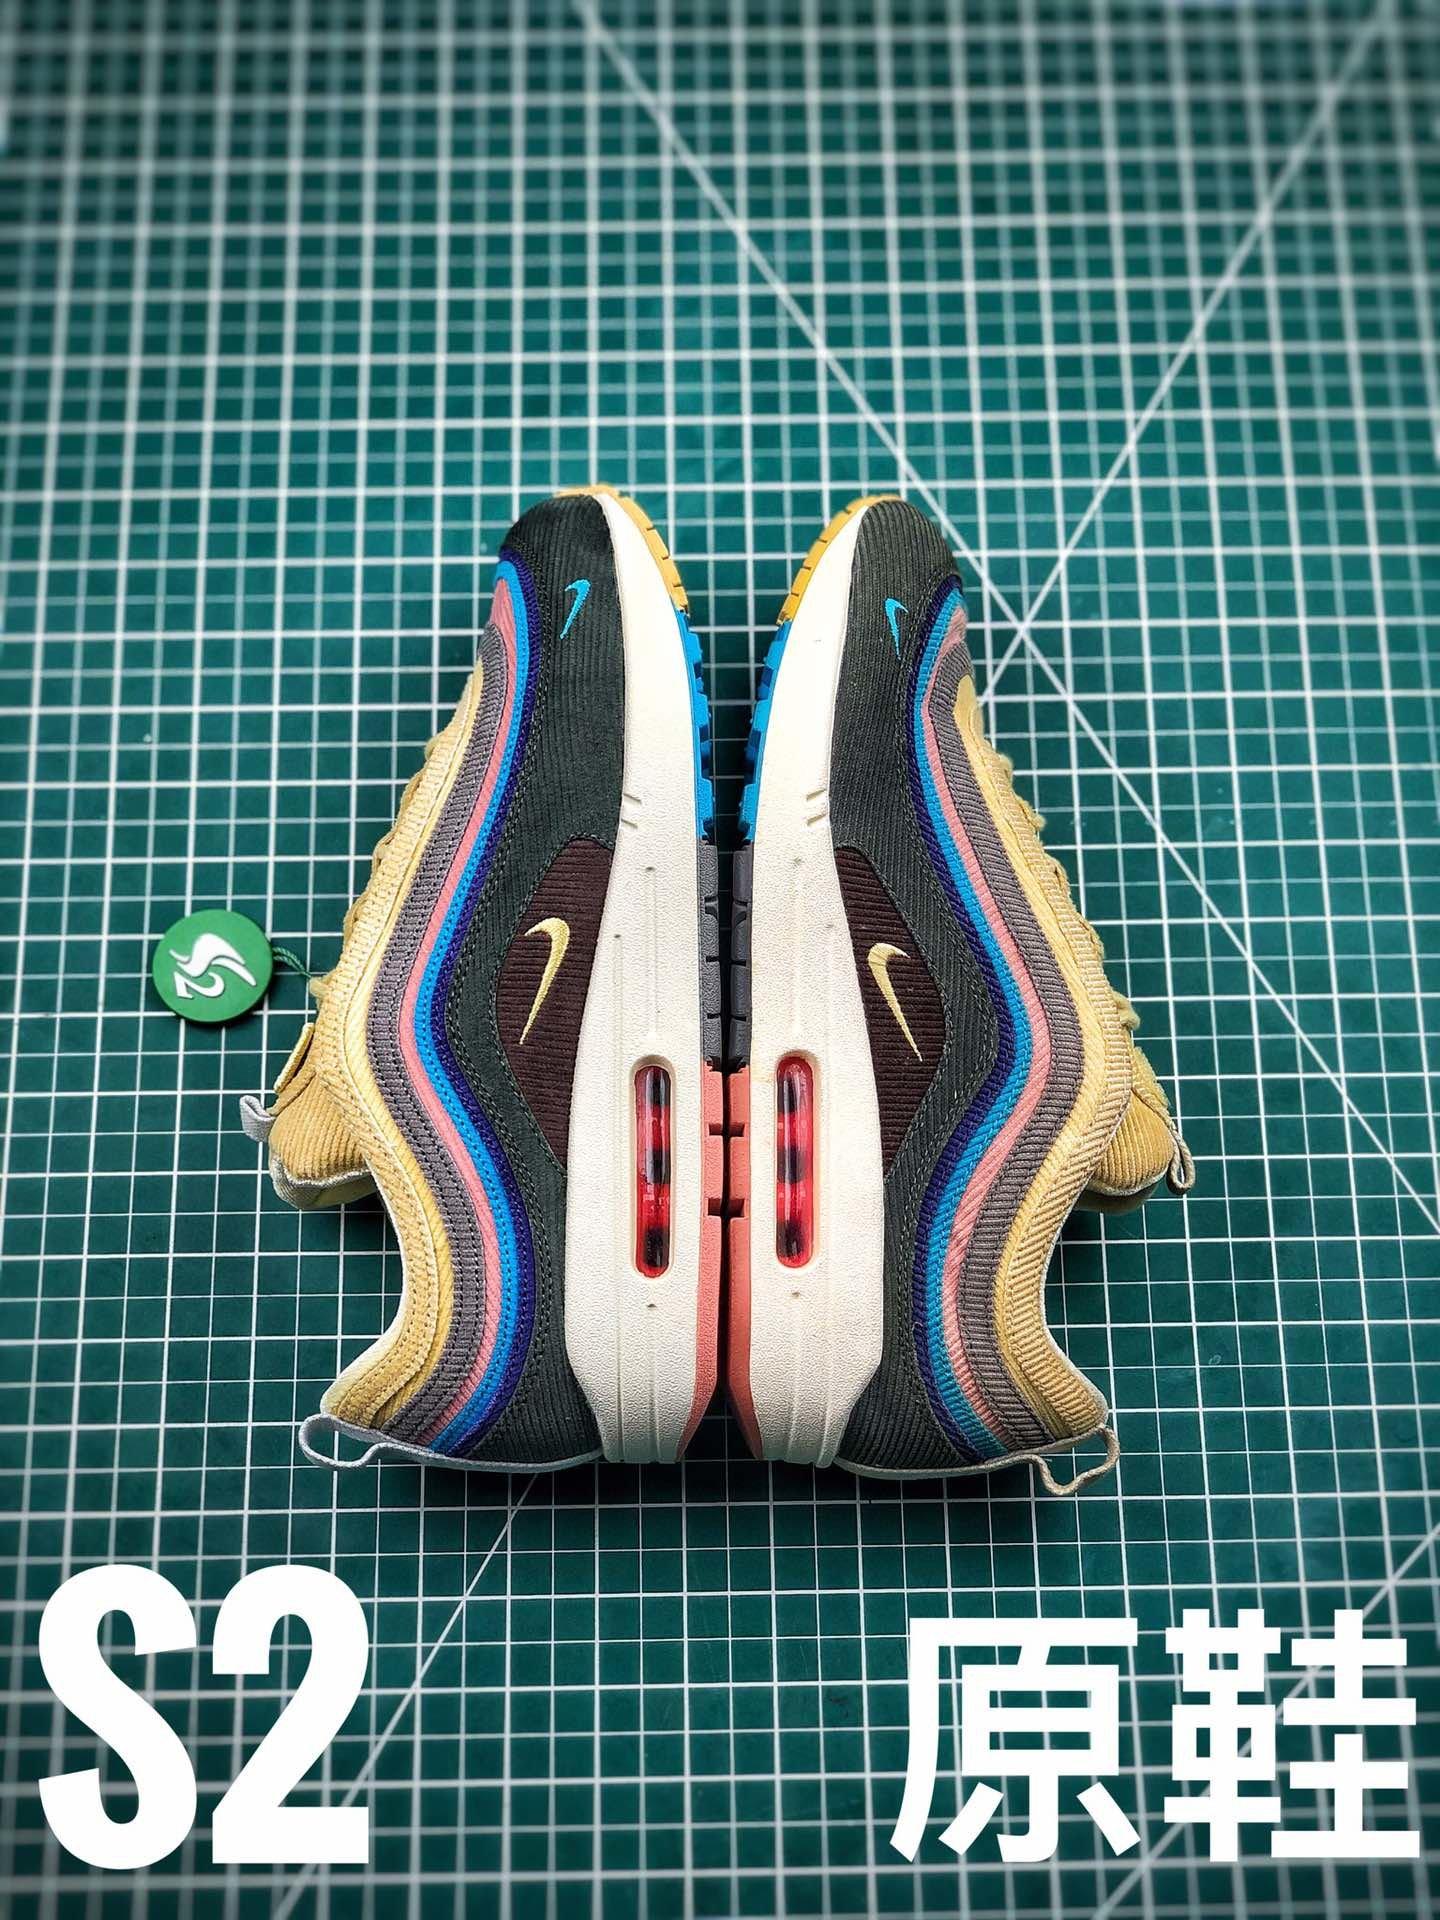 Air Max 1/97 灯芯绒 S2和原鞋对比图,PK纯原